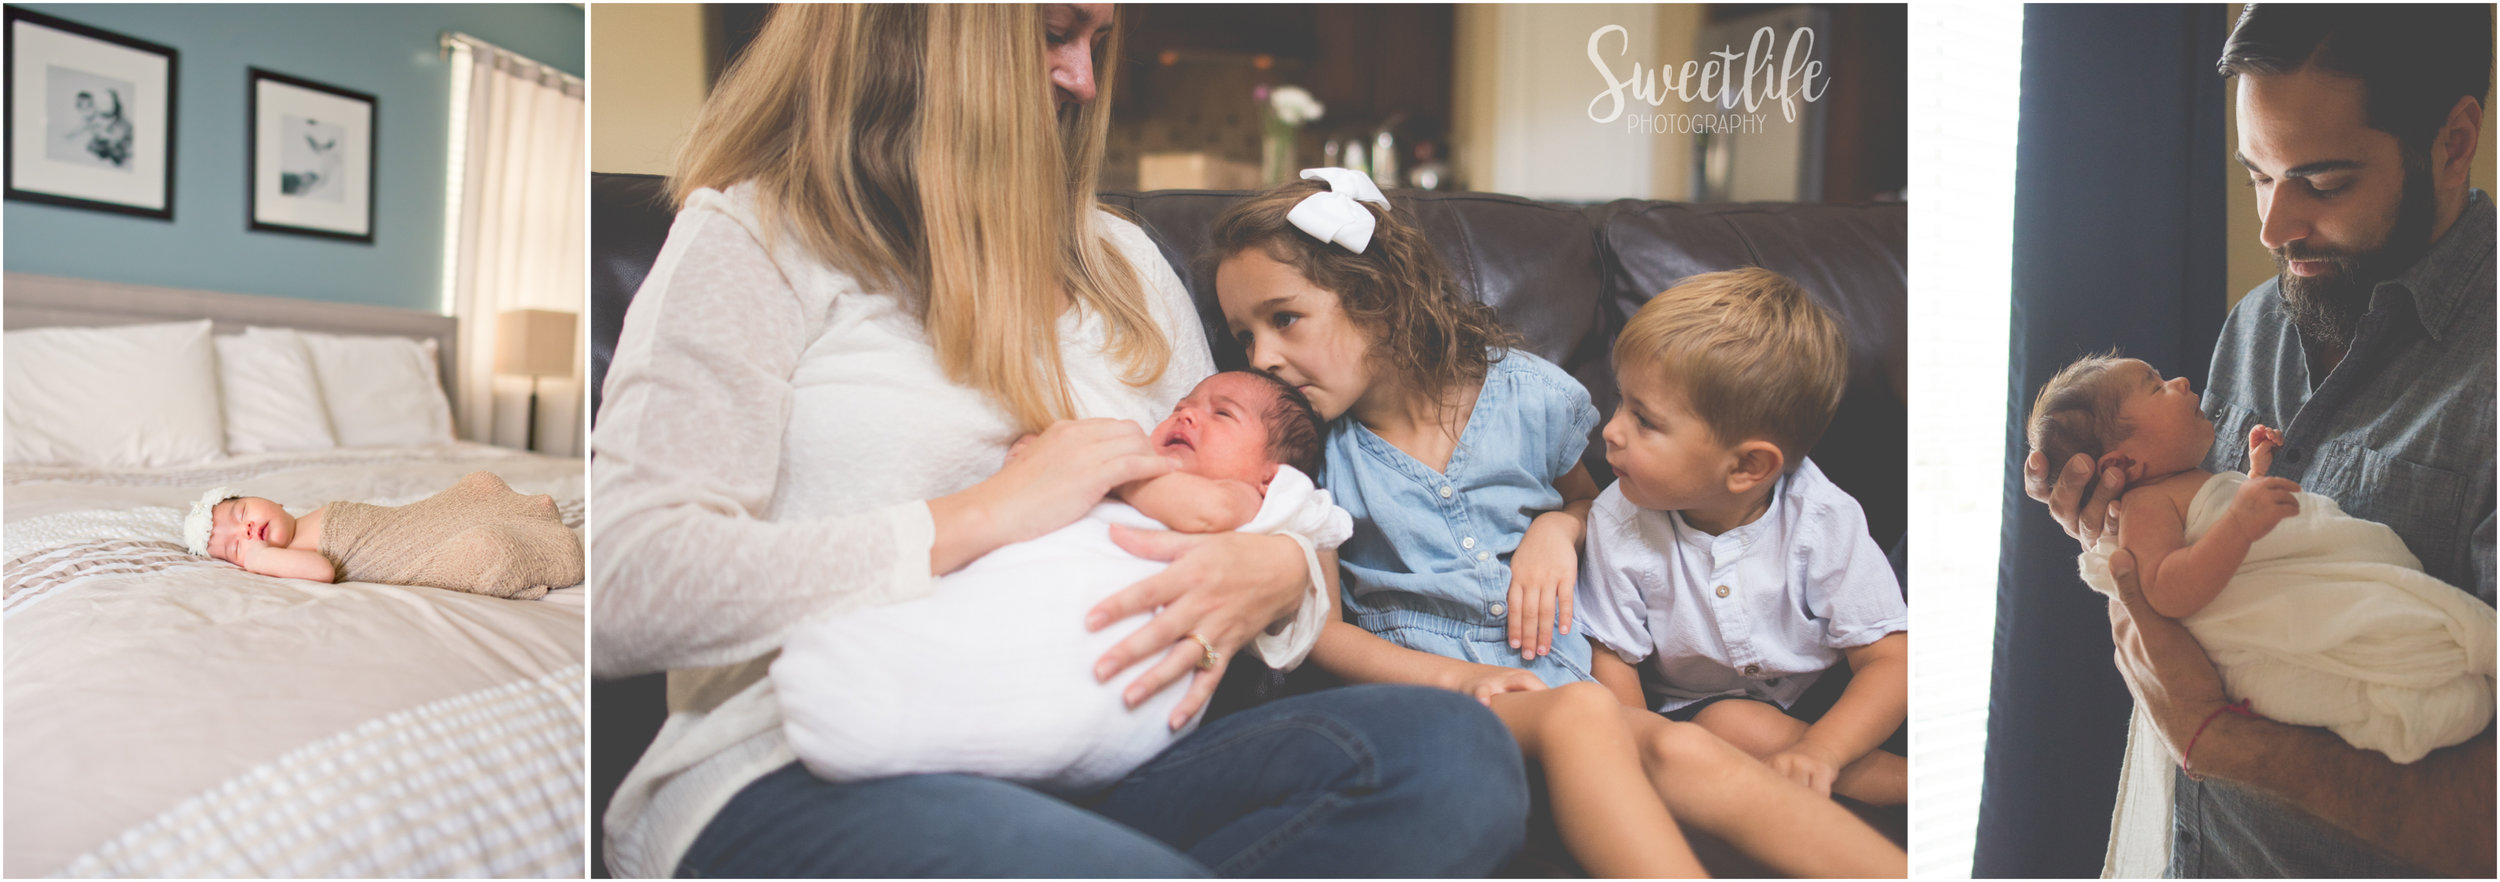 Phoenix-AZ-In-Home-Newborn-Photography-by-SweetLife-Photography-www.sweetlife-photography.com_.jpg